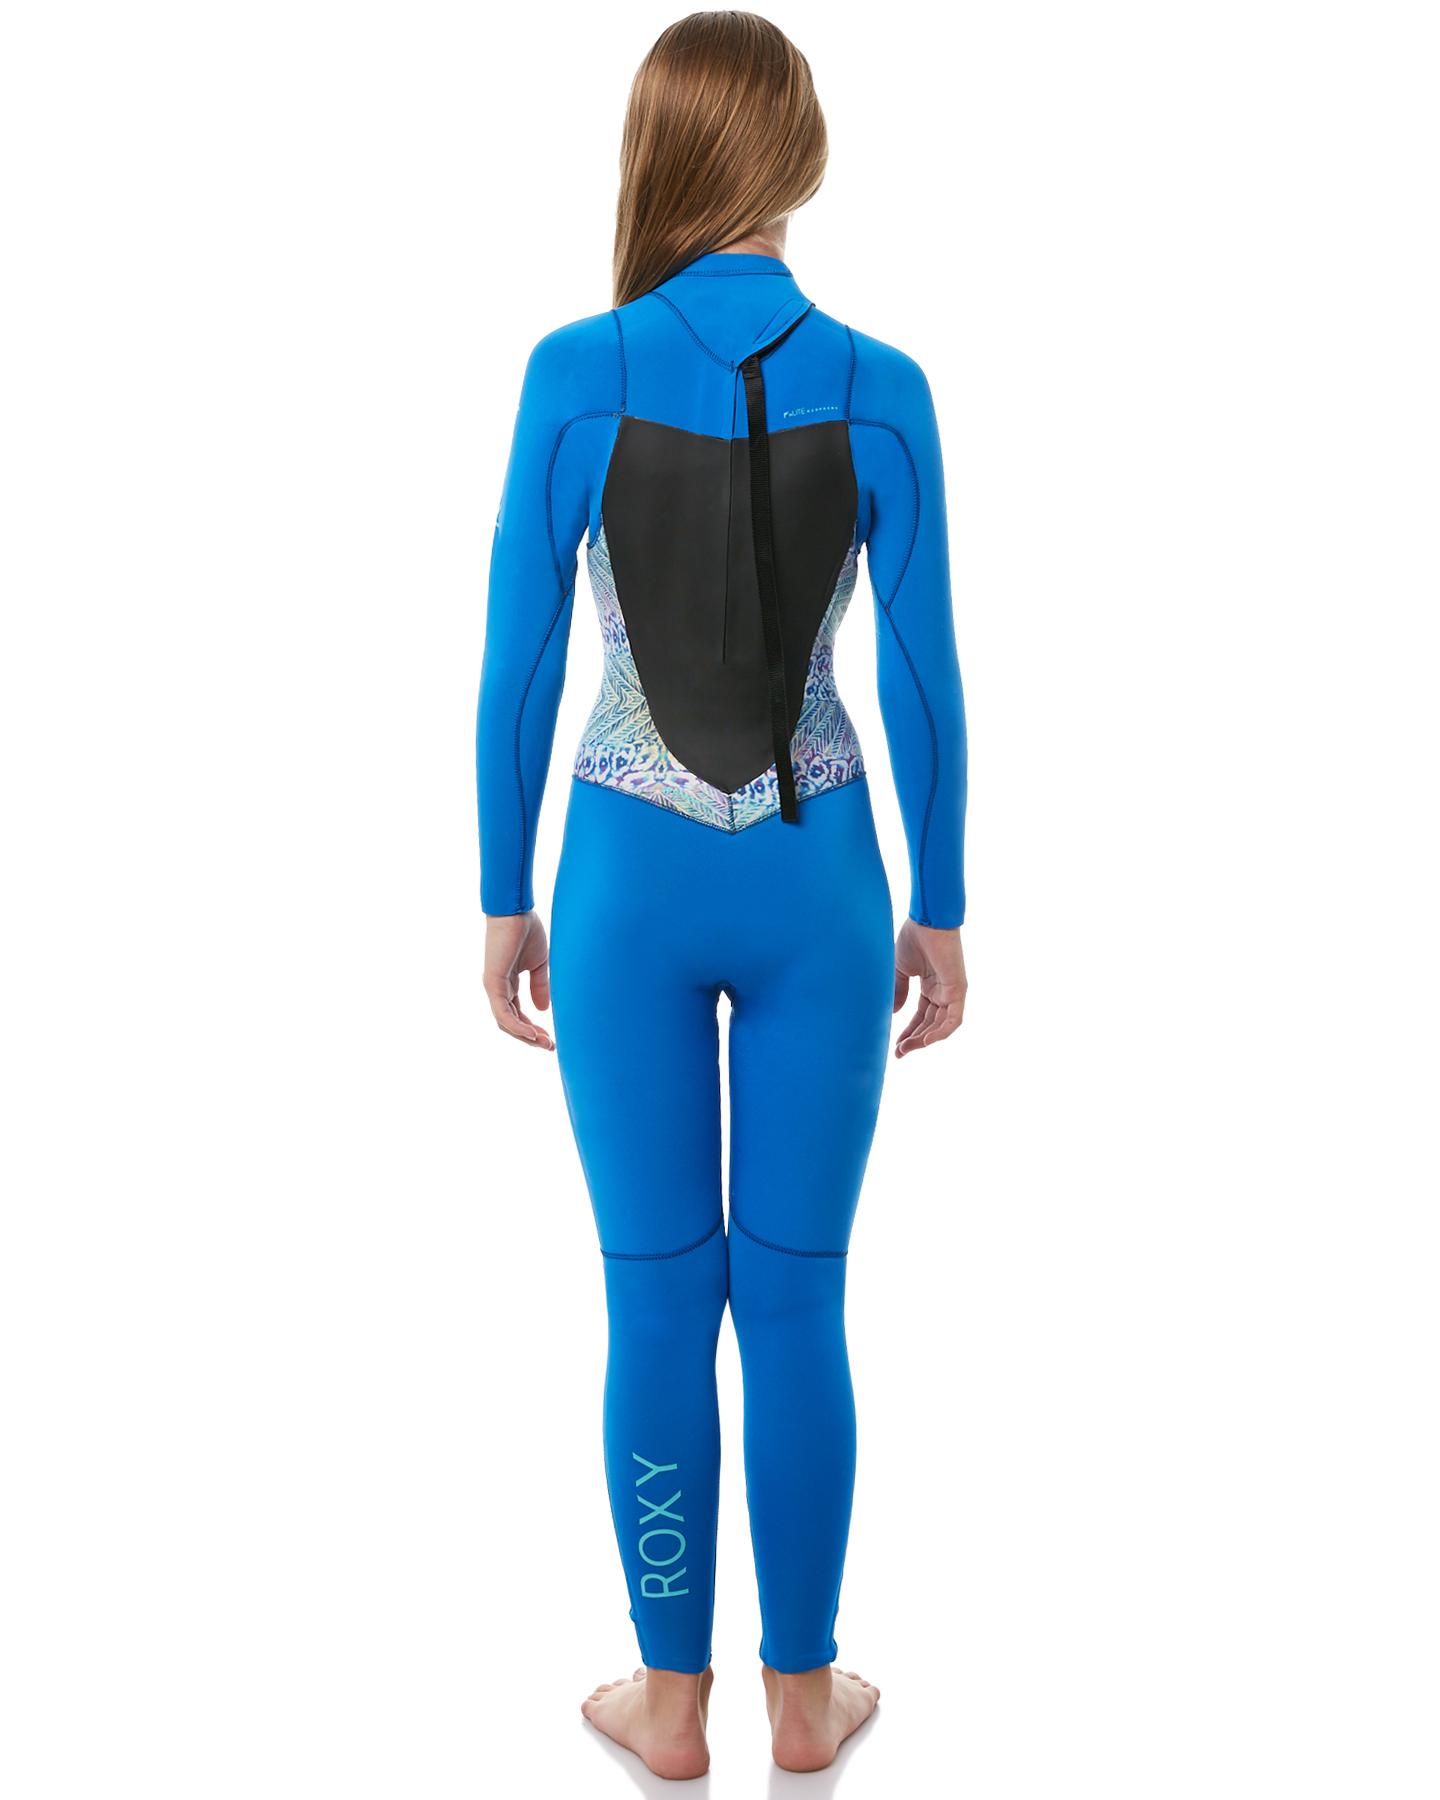 5c0f7b32d8 ... SEA BLUE II BOARDSPORTS SURF ROXY GIRLS - ERGW103016BYH0